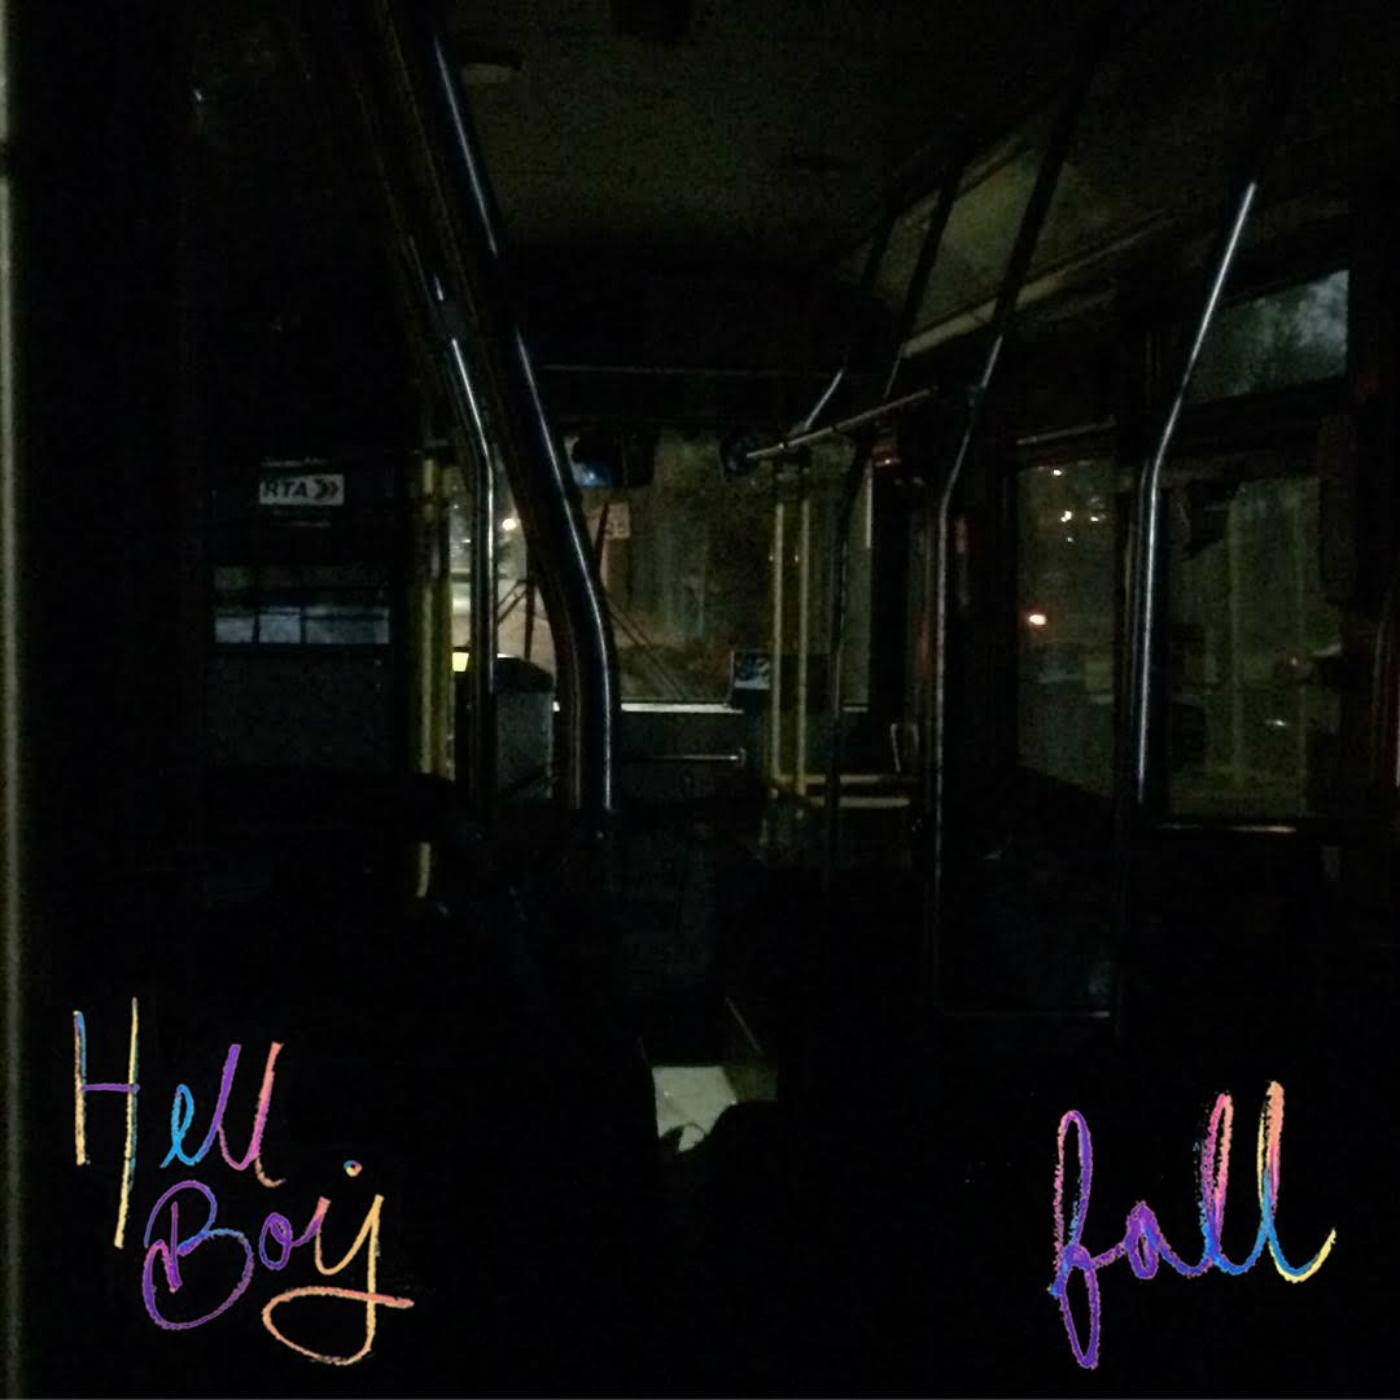 hellboy.hellboy (@hellboy_hellboy) Cover Image